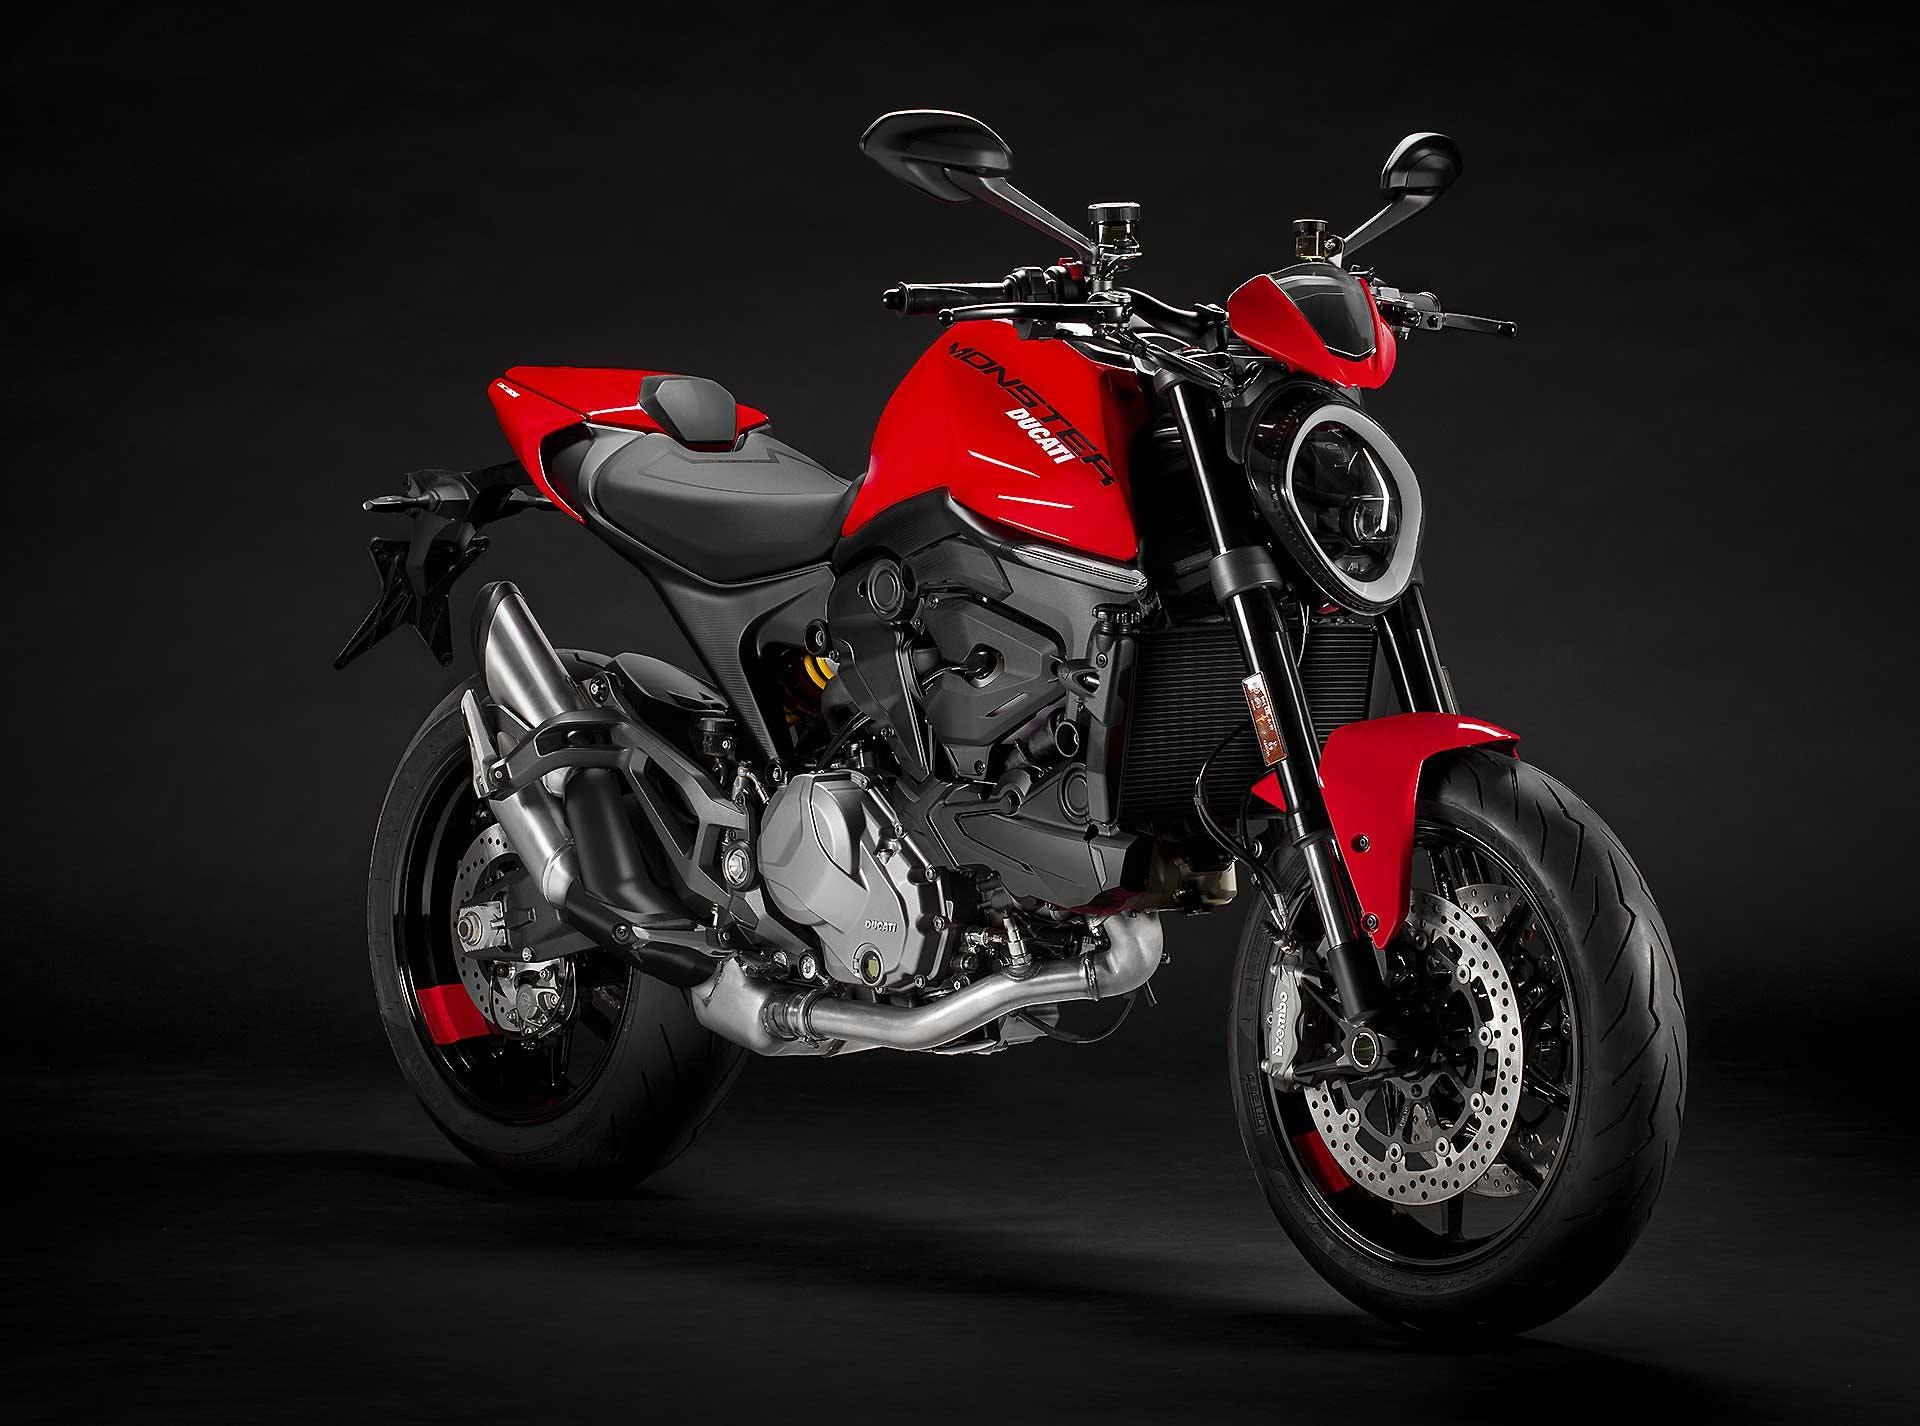 Ducati Monster 2021 migliori moto per neopatentati A2